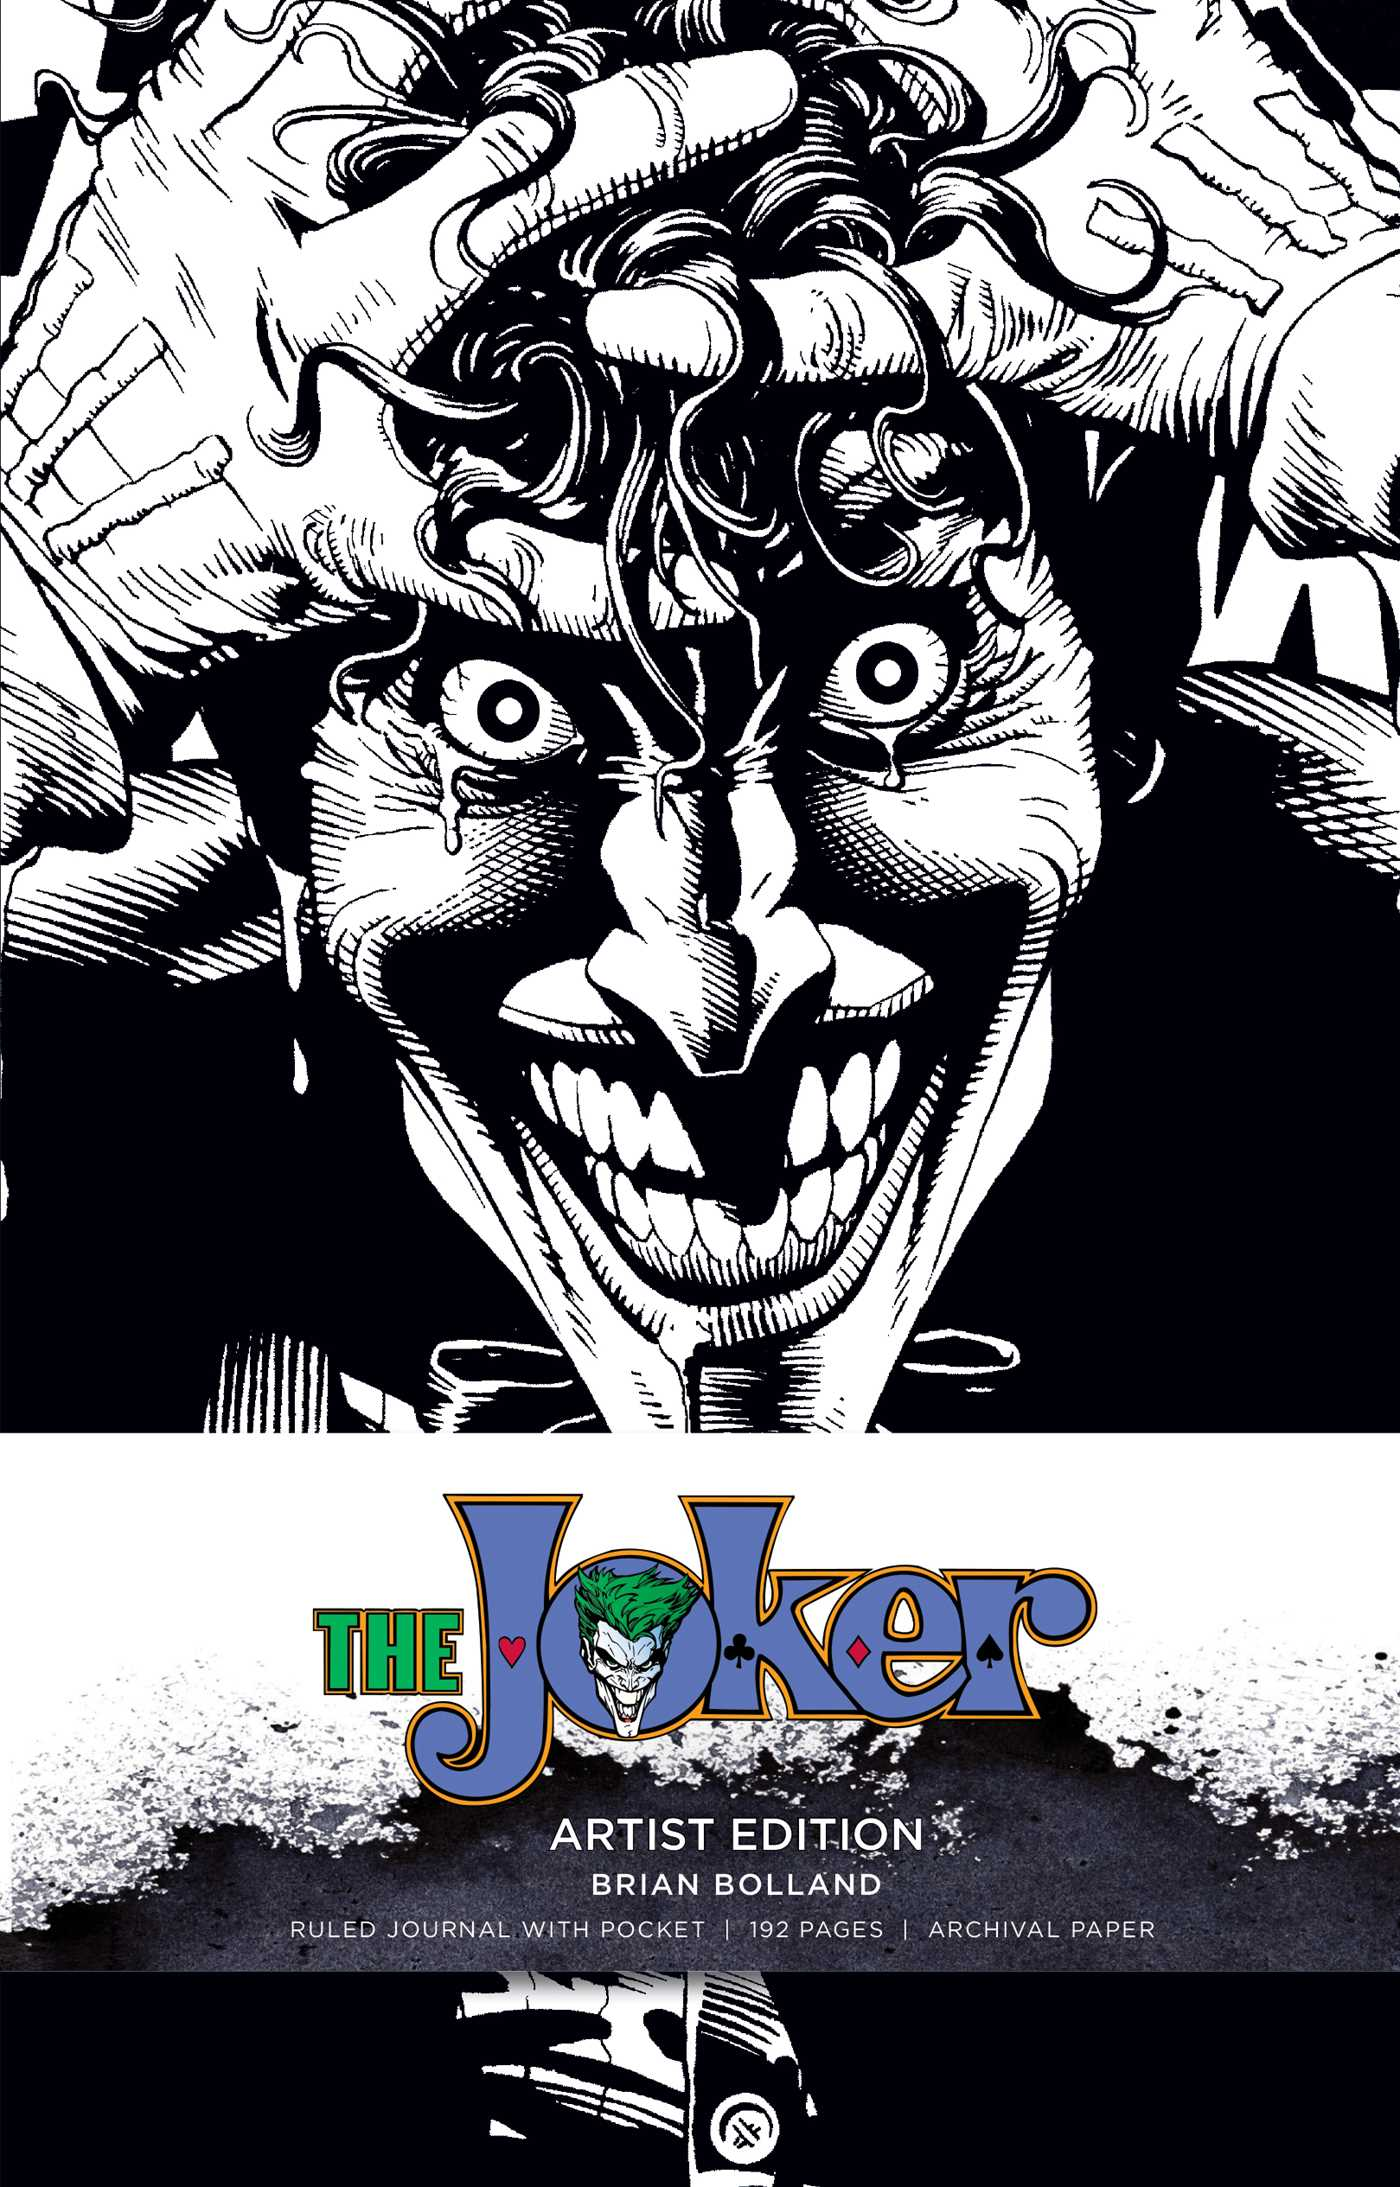 Dc comics the joker hardcover ruled journal artist edition 9781683833307 hr